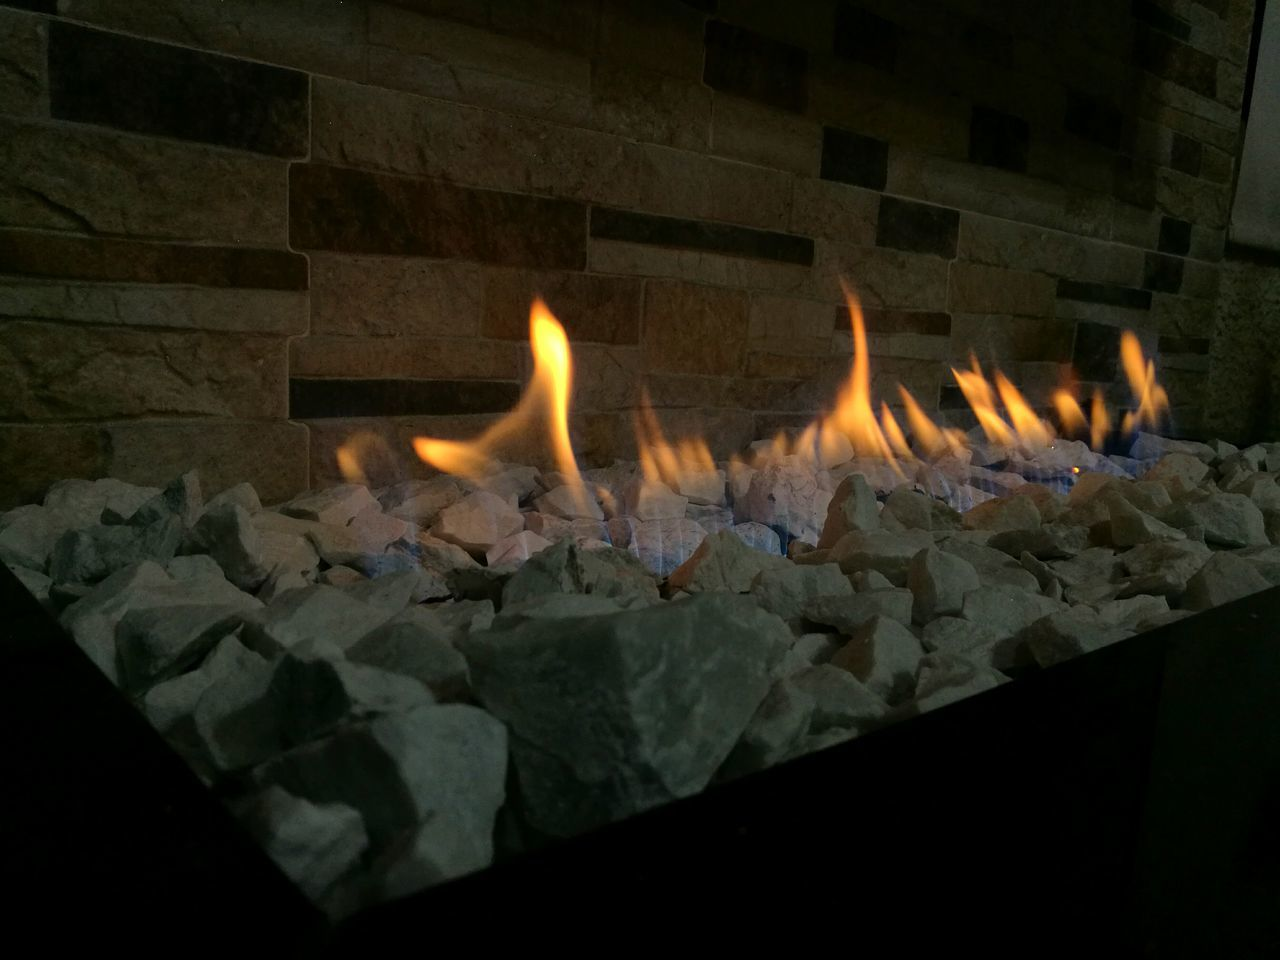 flame, burning, heat - temperature, no people, indoors, close-up, illuminated, night